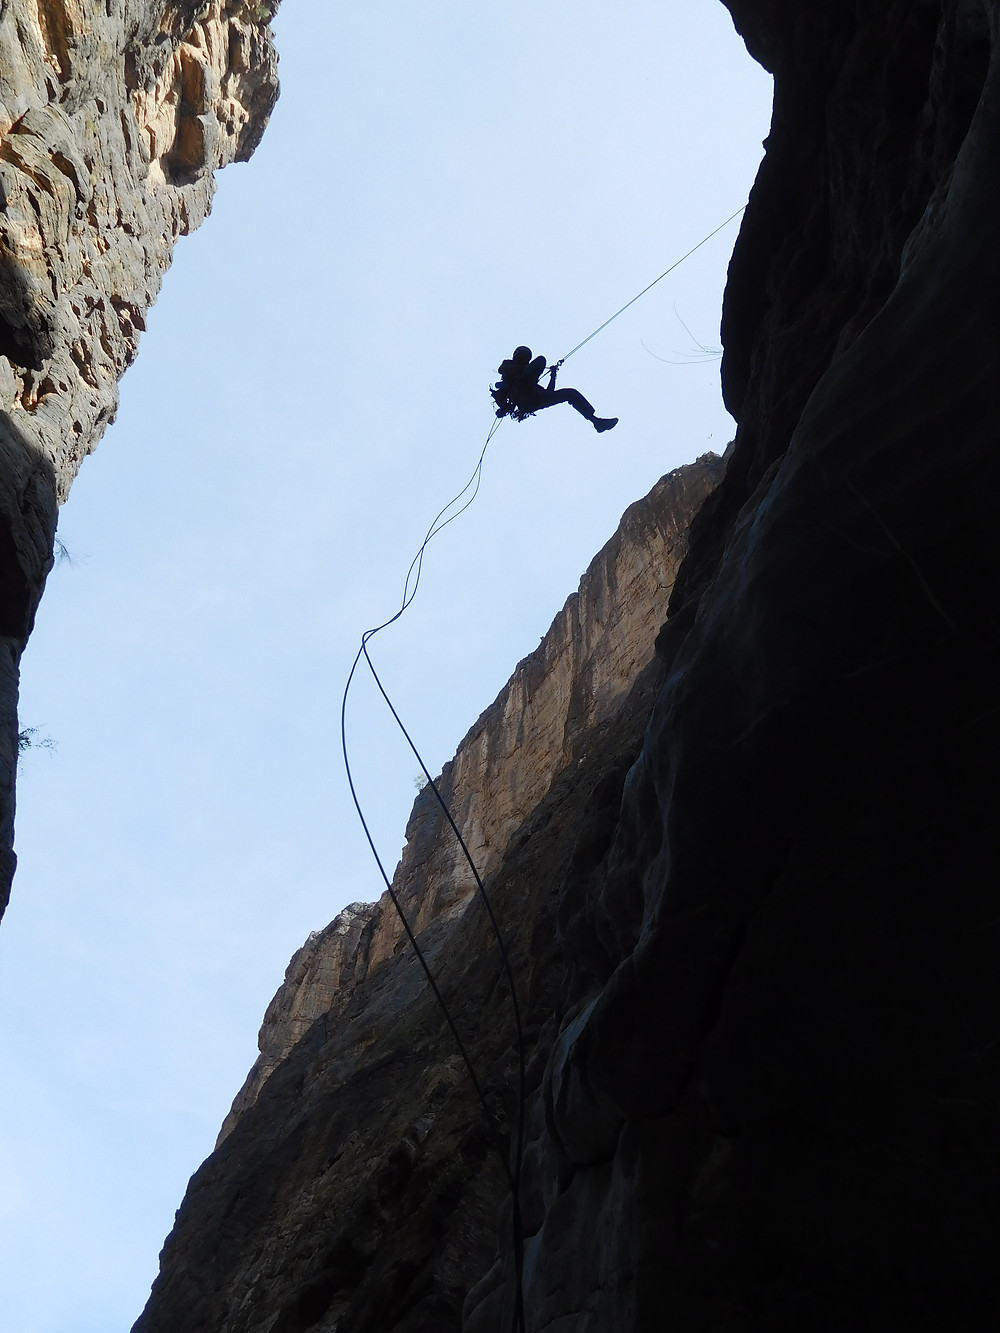 Oman Klettern Alpinklettern Erstbegehung Kletterreise I think it´s cool Al Kumeira Jebel Misht Topo